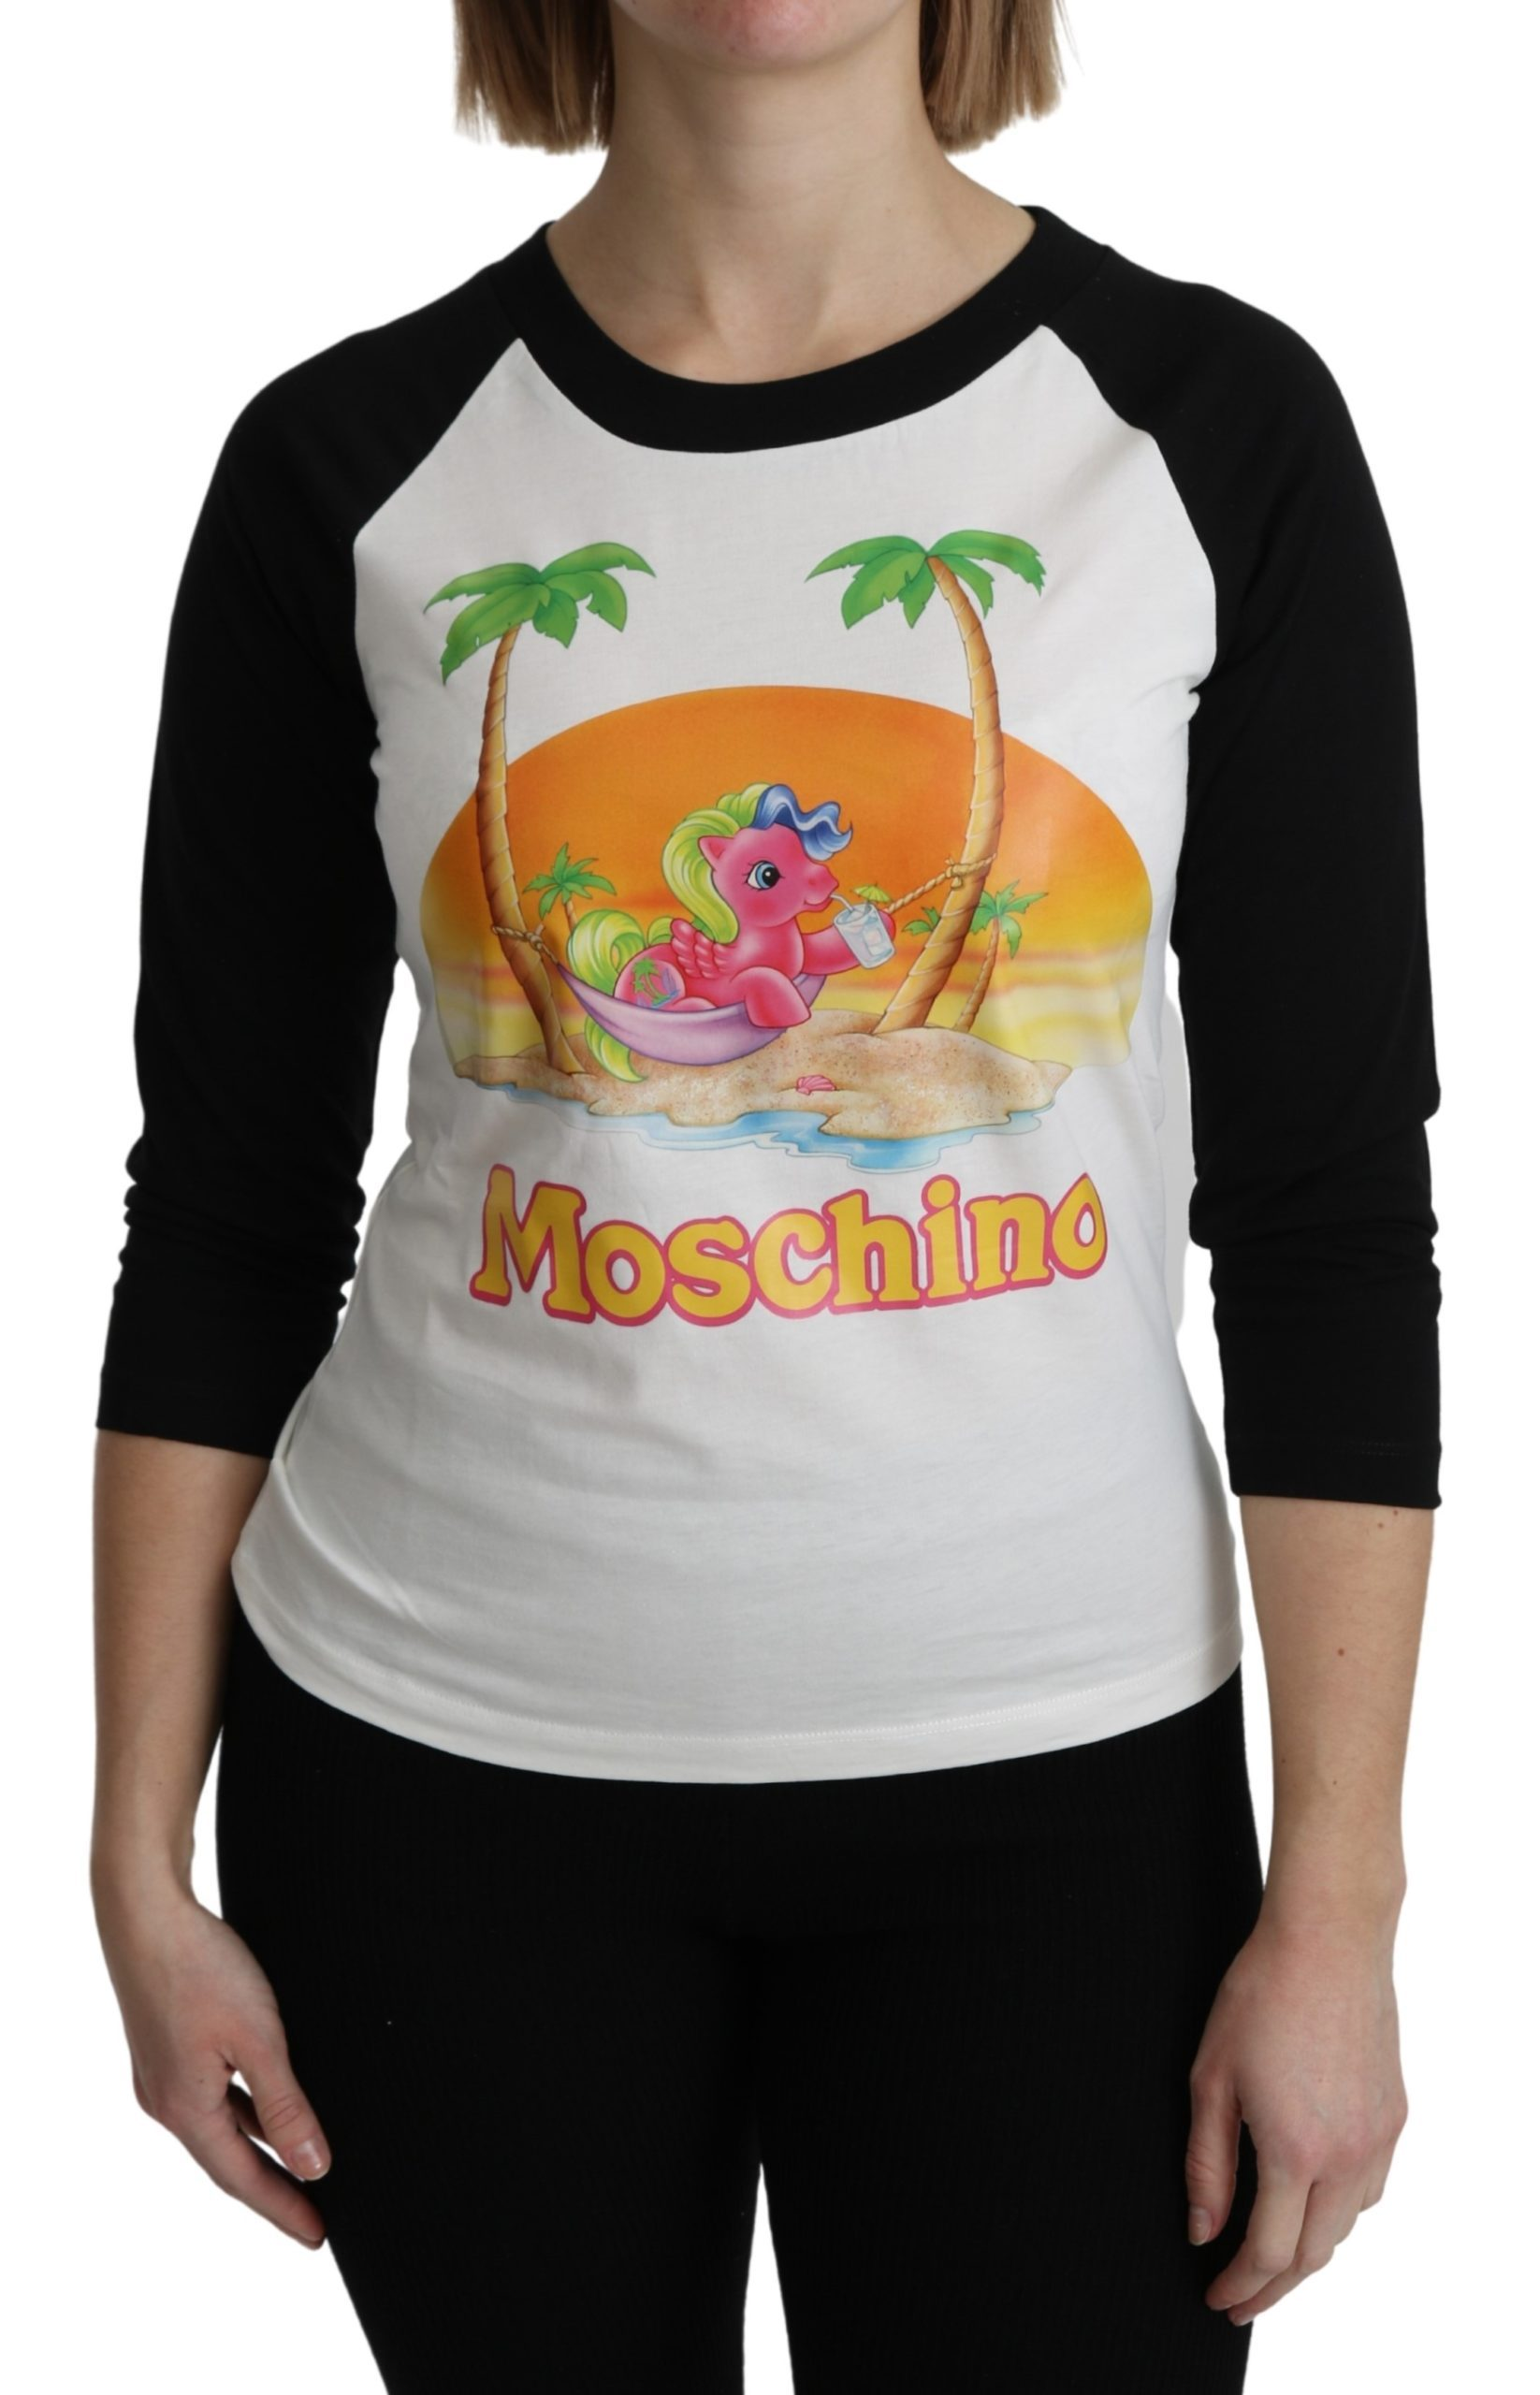 Moschino Women's Cotton My Little Pony Top White TSH5086 - IT36 | XS